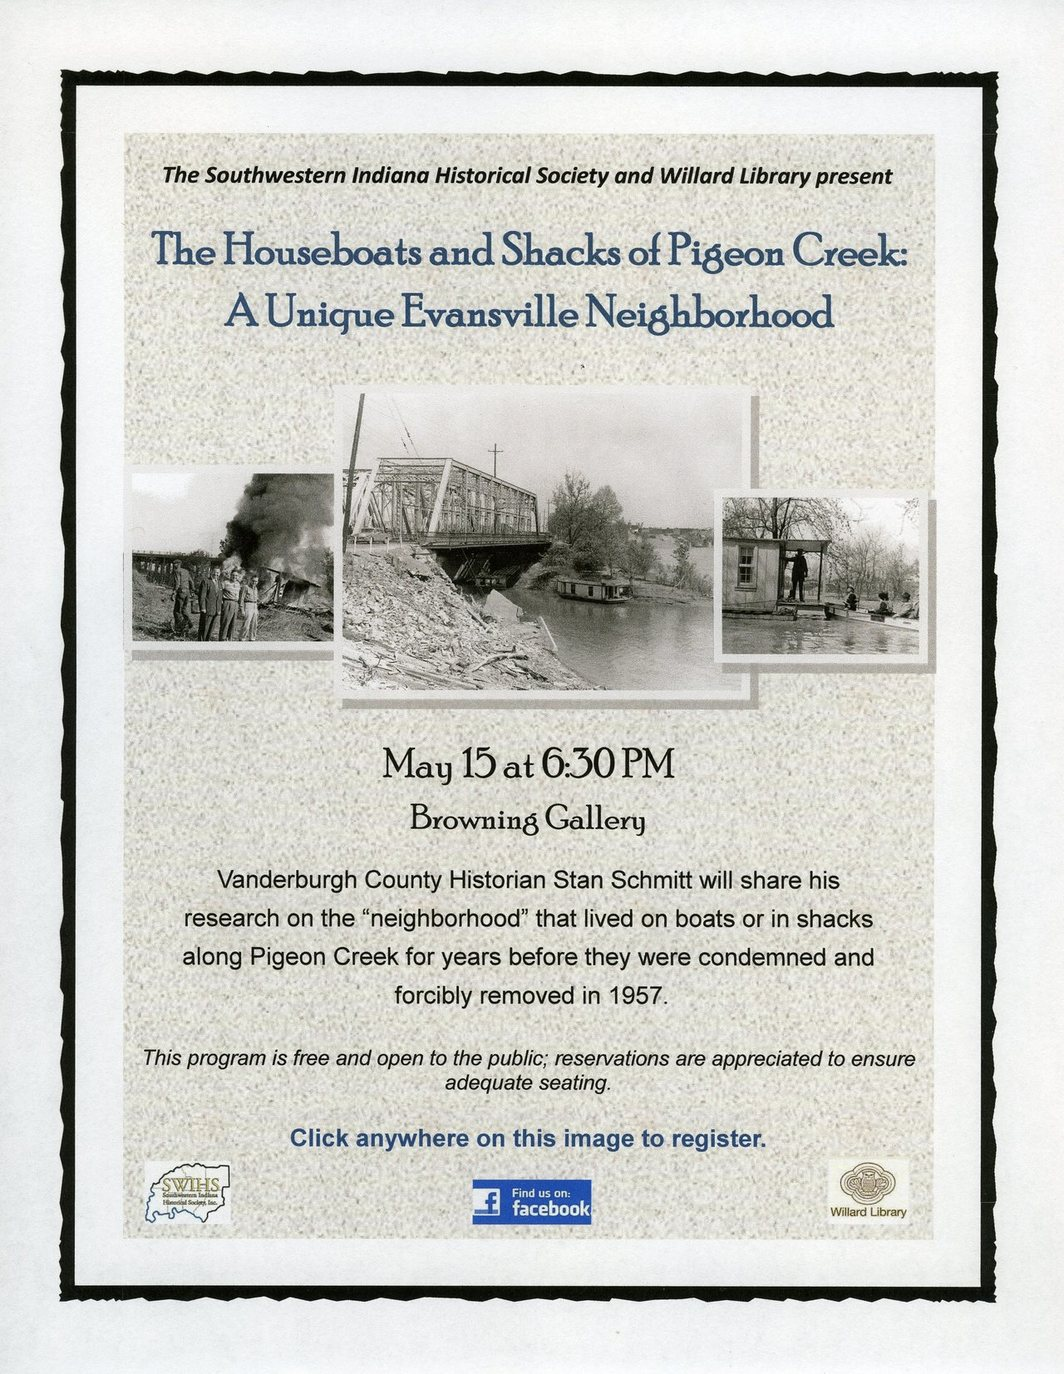 History of Pigeon Creek program